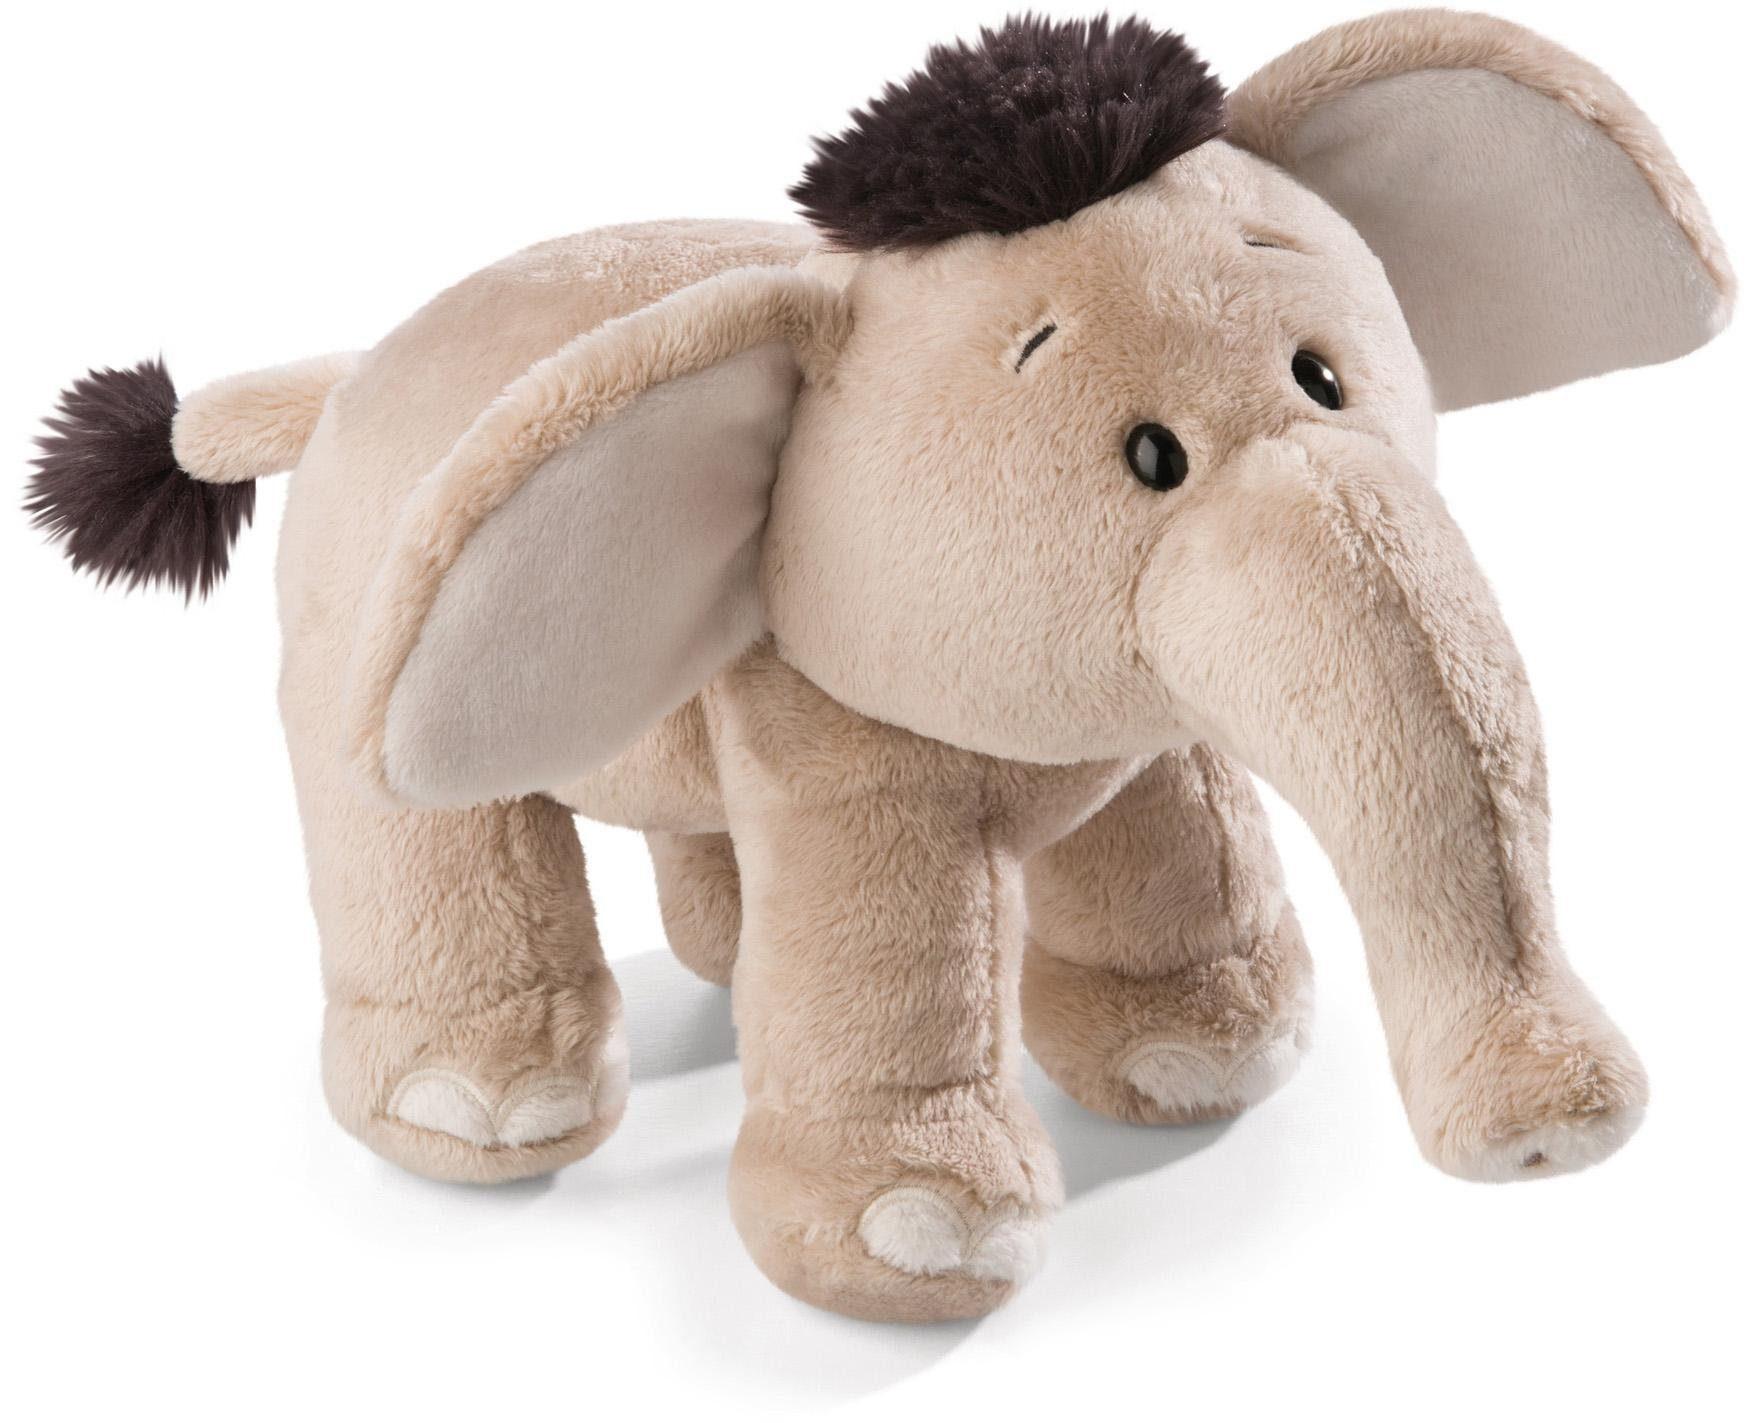 NICI Plüschtier, »Elefant El-Frido, stehend, 22 cm«